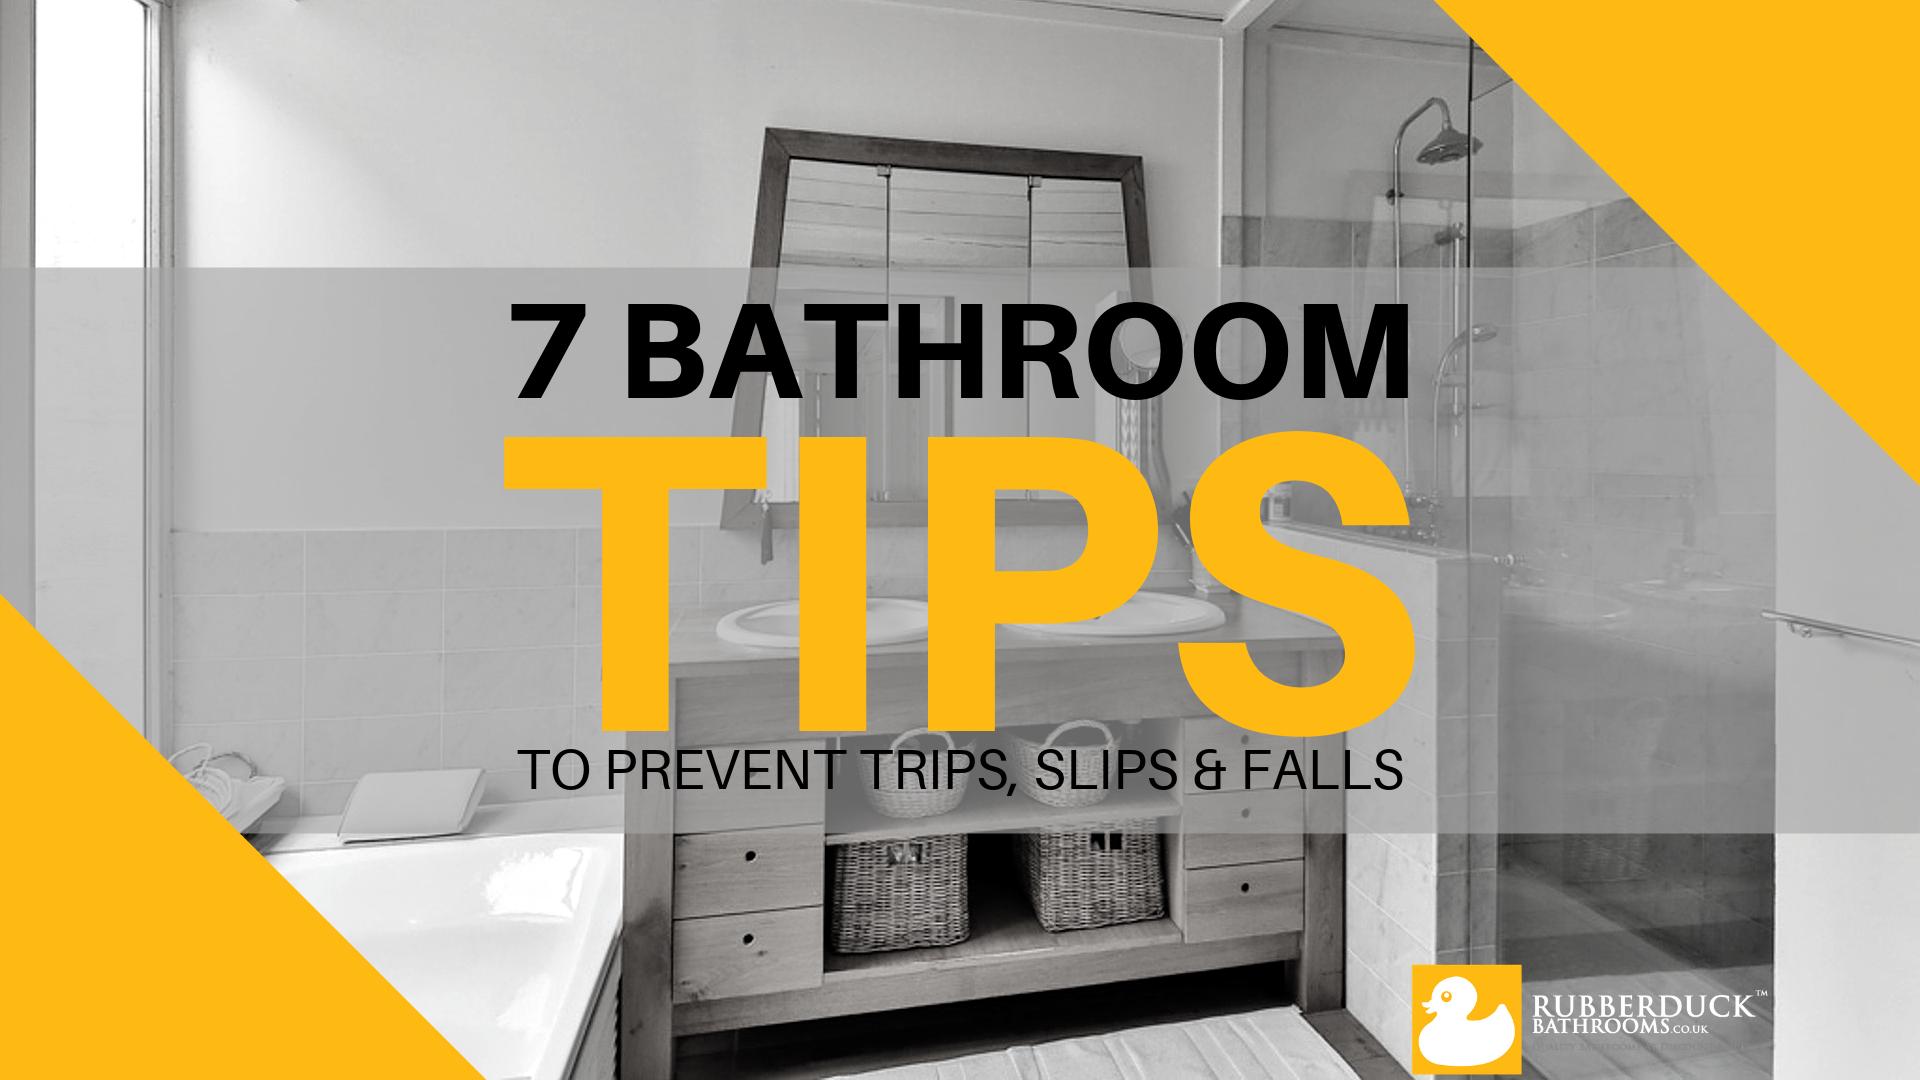 7 Bathroom Tips to Prevent Slips, Trips & Falls